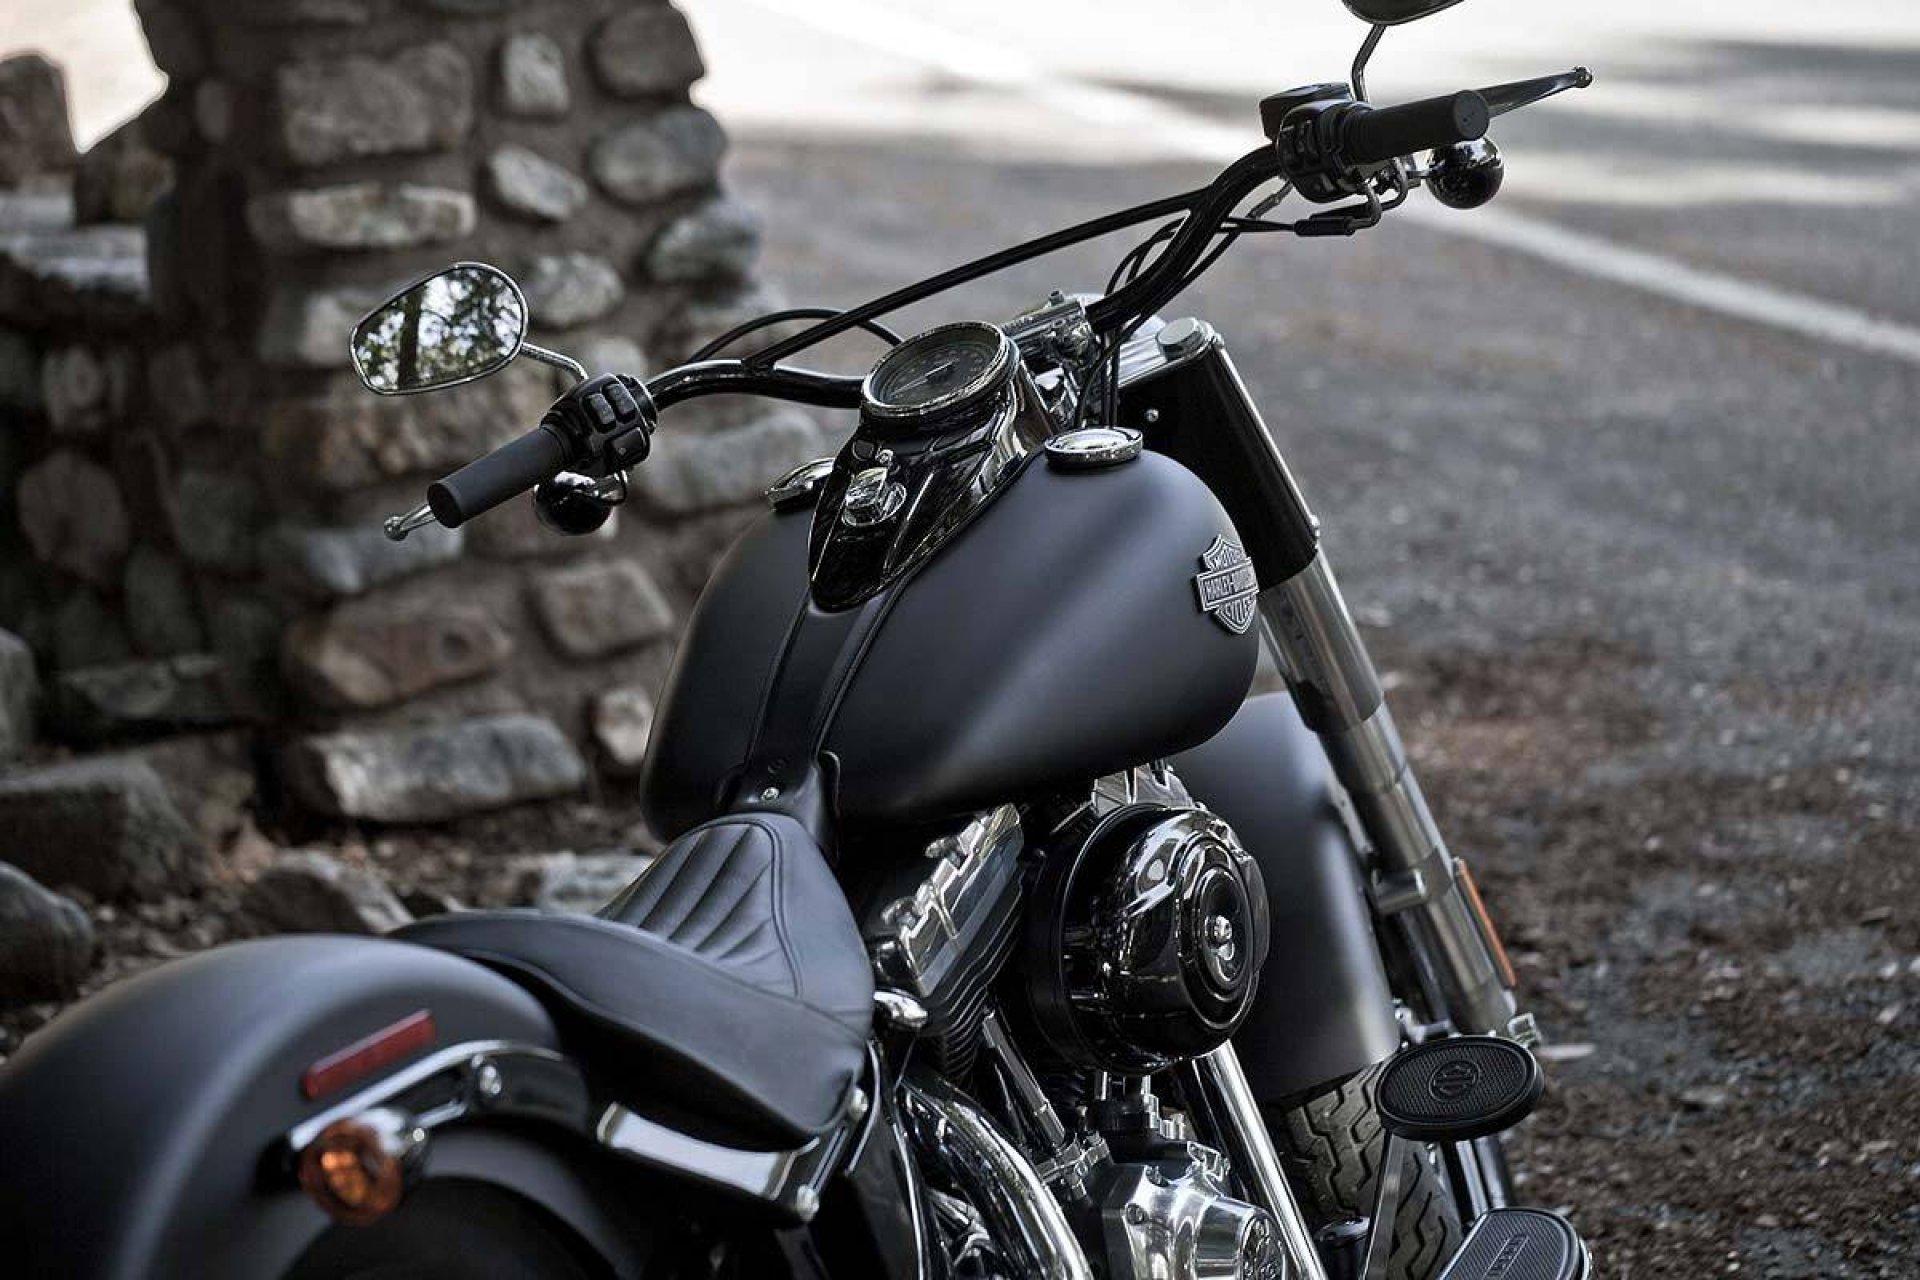 Black Motorcycle Harley Davidson Wallpaper Bes 10709 1920x1280